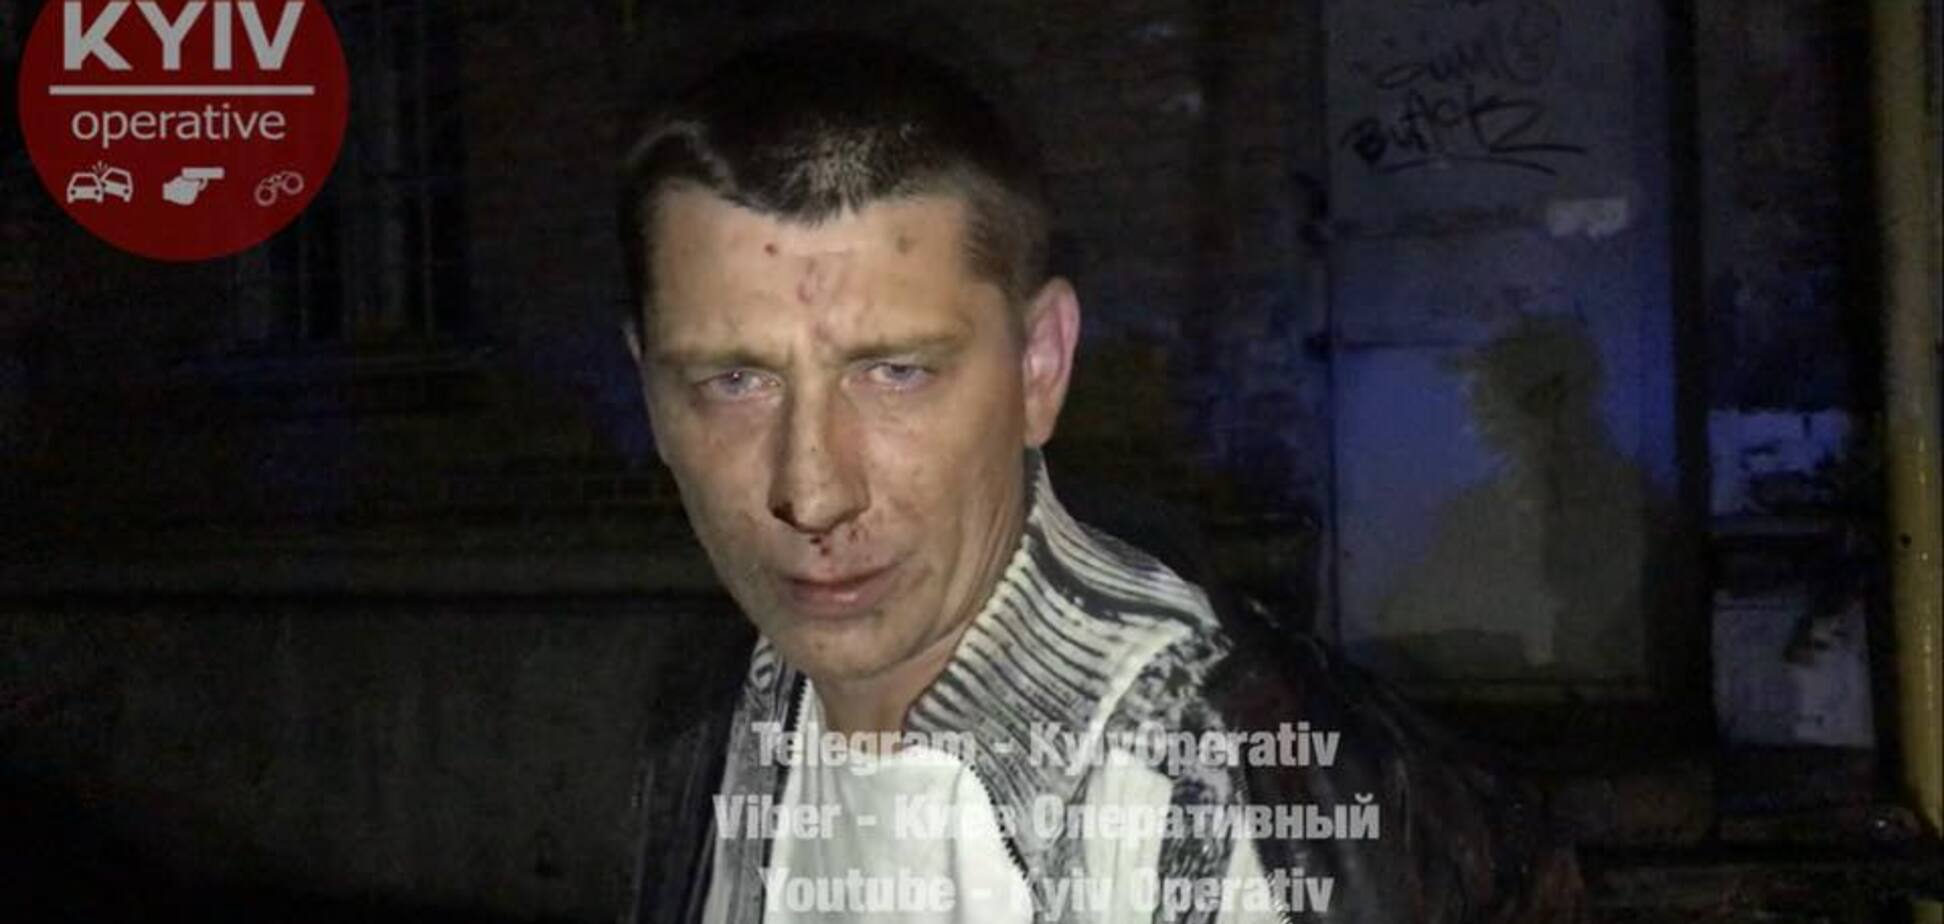 Пытался съесть ключи от авто: в Киеве поймали пьяного таксиста